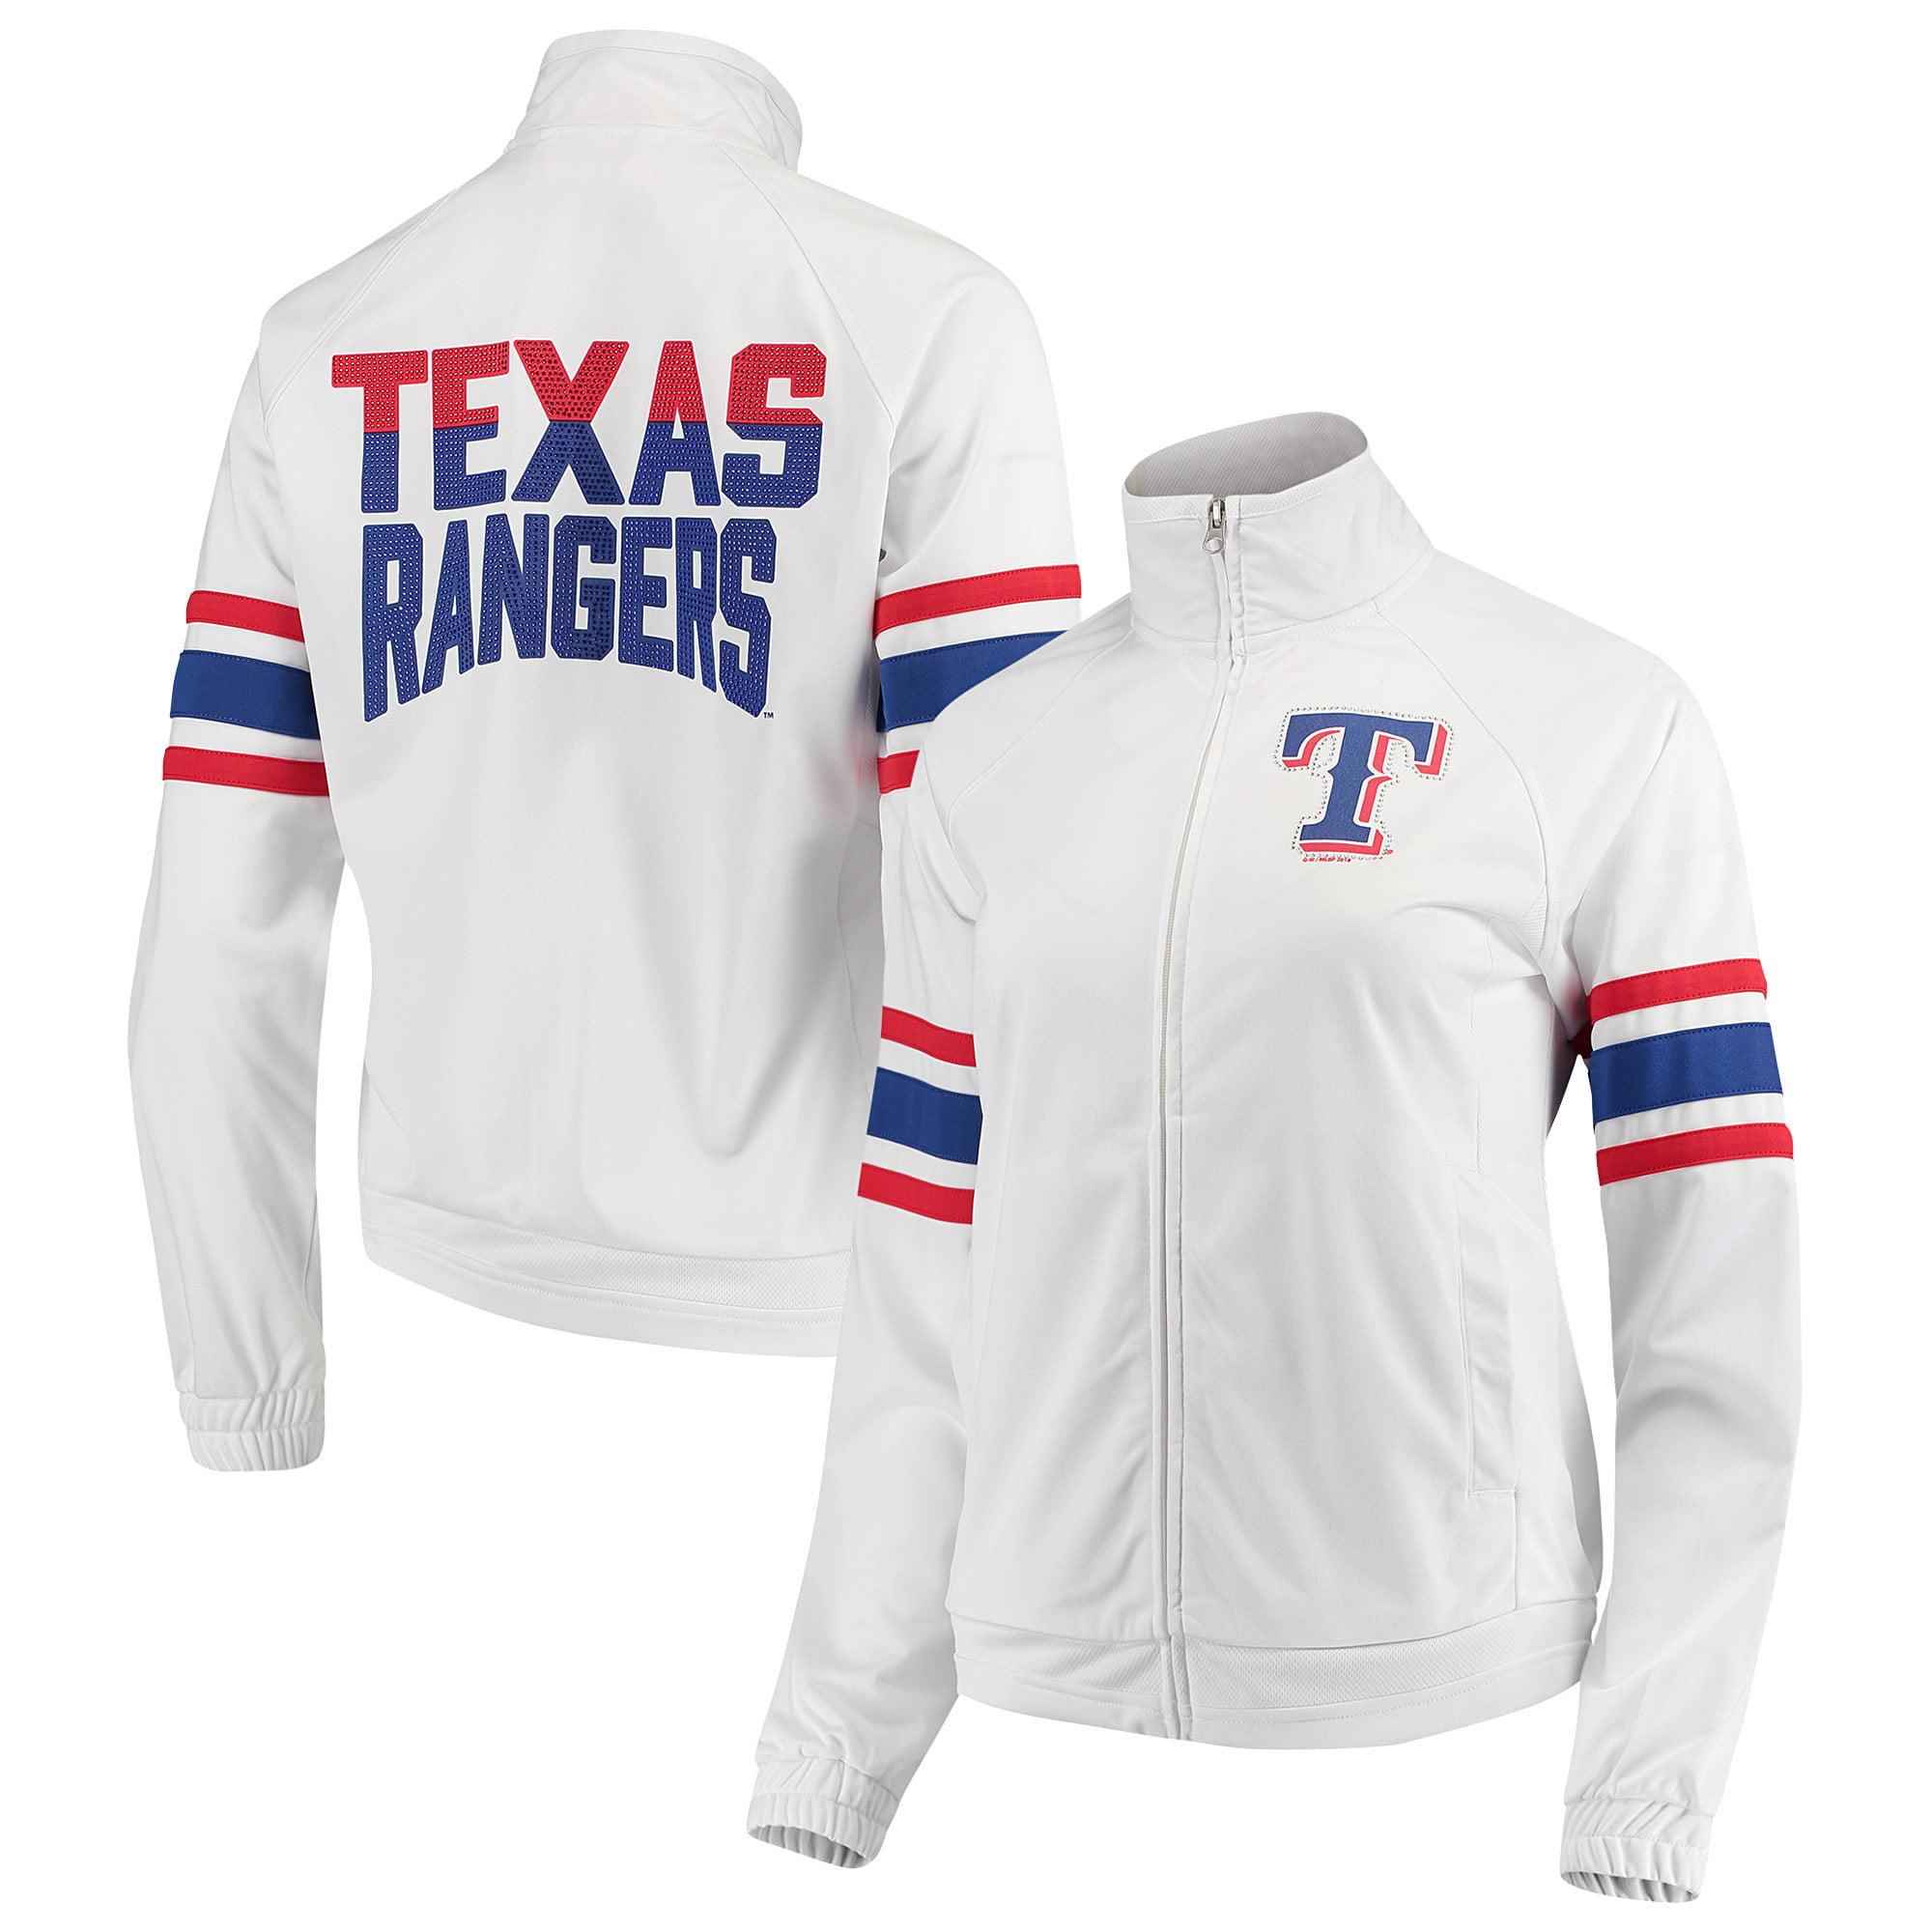 Texas Rangers G-III 4Her by Carl Banks Women's Game Score Full-Zip Track Jacket - White